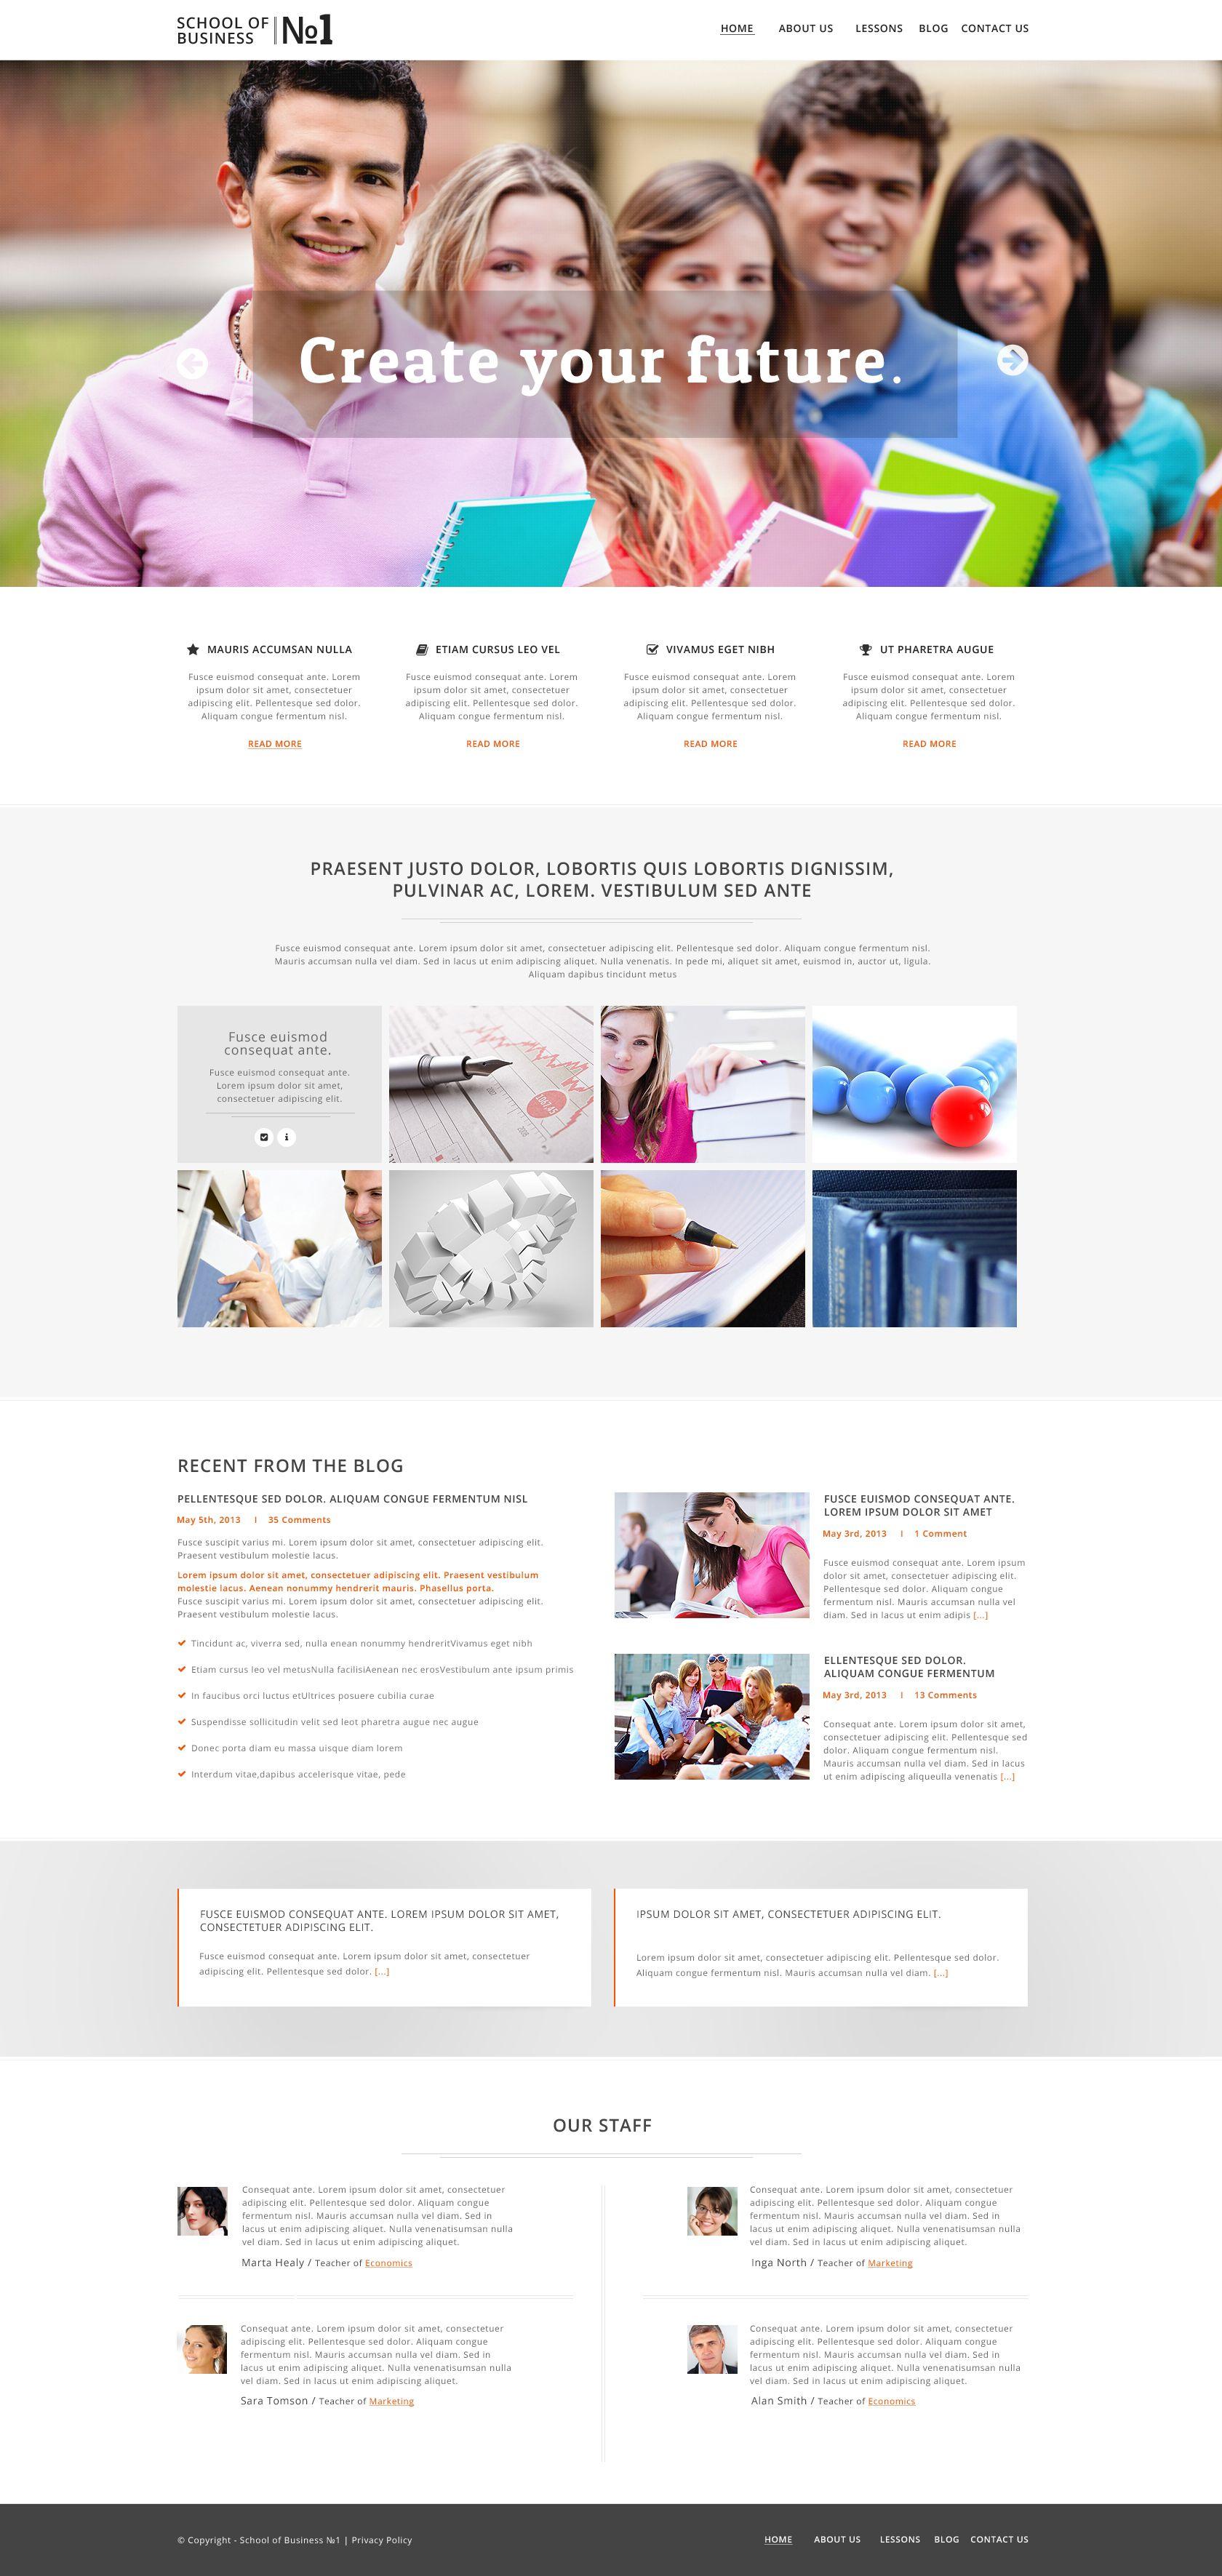 Web Designing Kenya Kenya Web Designing Web Designer Website Design Design Web Web Desi Web Design Services Web Development Design Professional Web Design